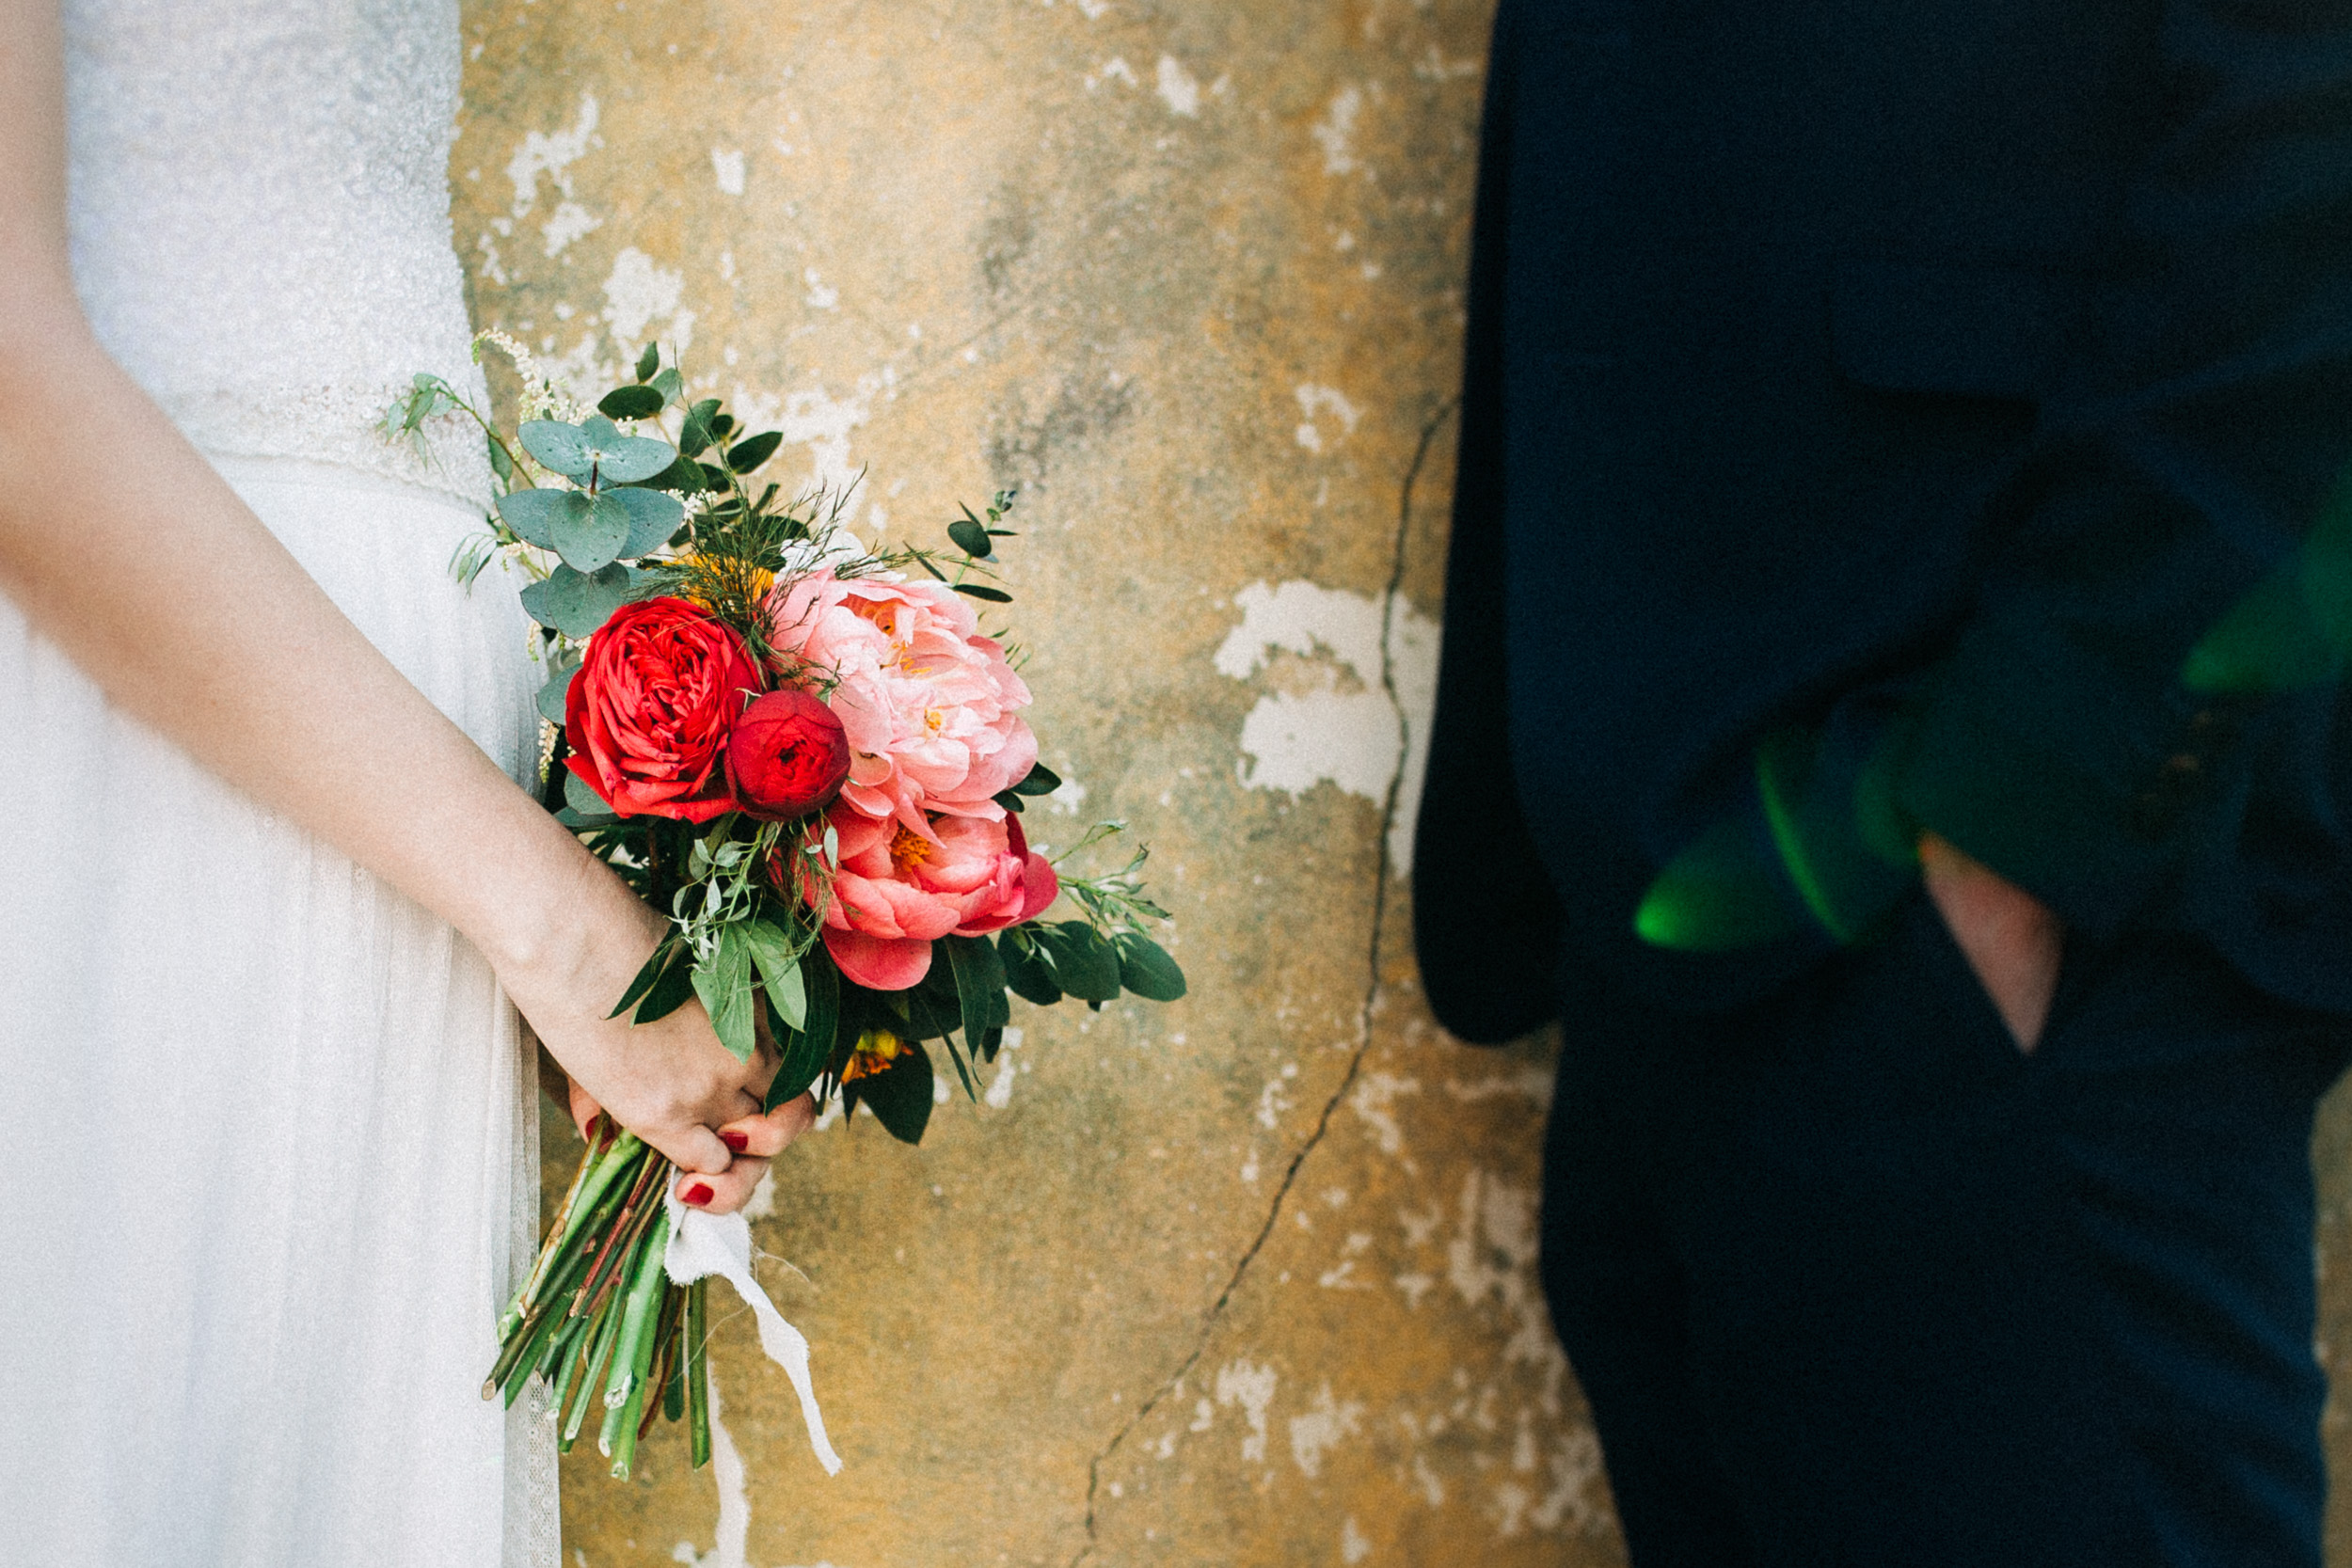 Cardiff Photographer Alex Sedgmond - Photography South Wales - The Printhaus, Cardiff Wedding Photography-15.jpg